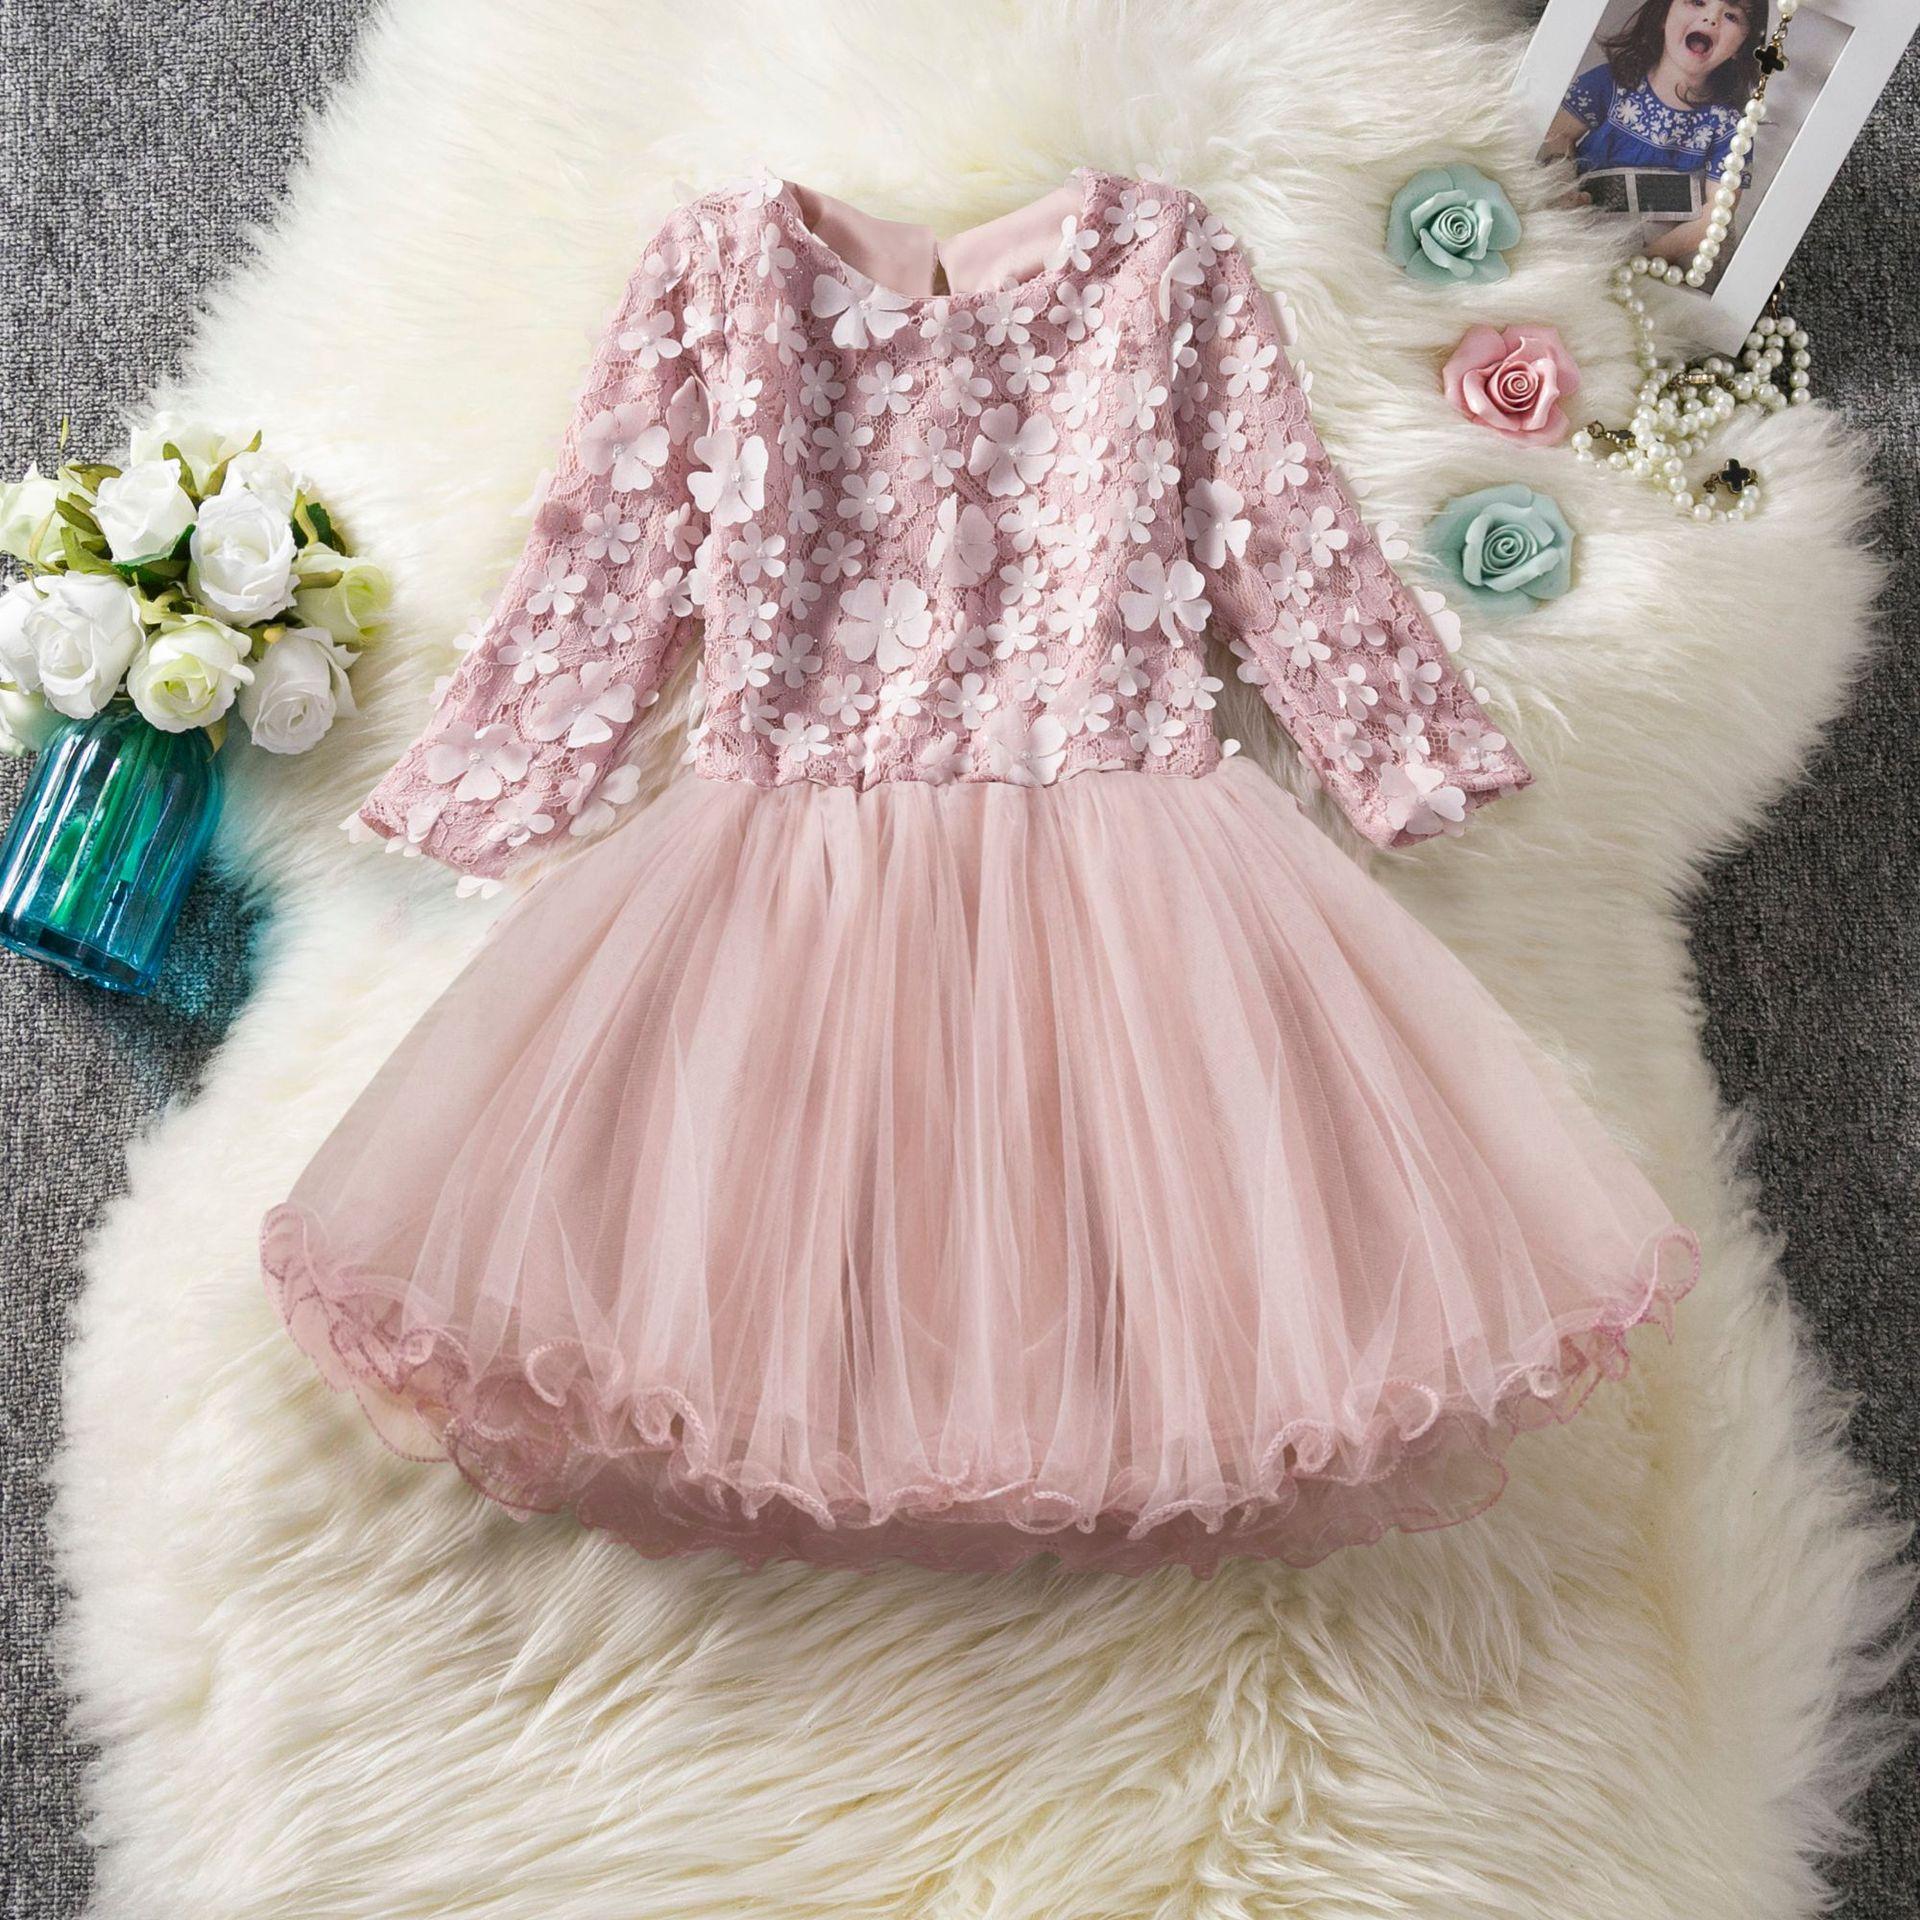 751c68d563508 Children Clothing Princess Kids Party Costume Teenage Girl Fancy ...